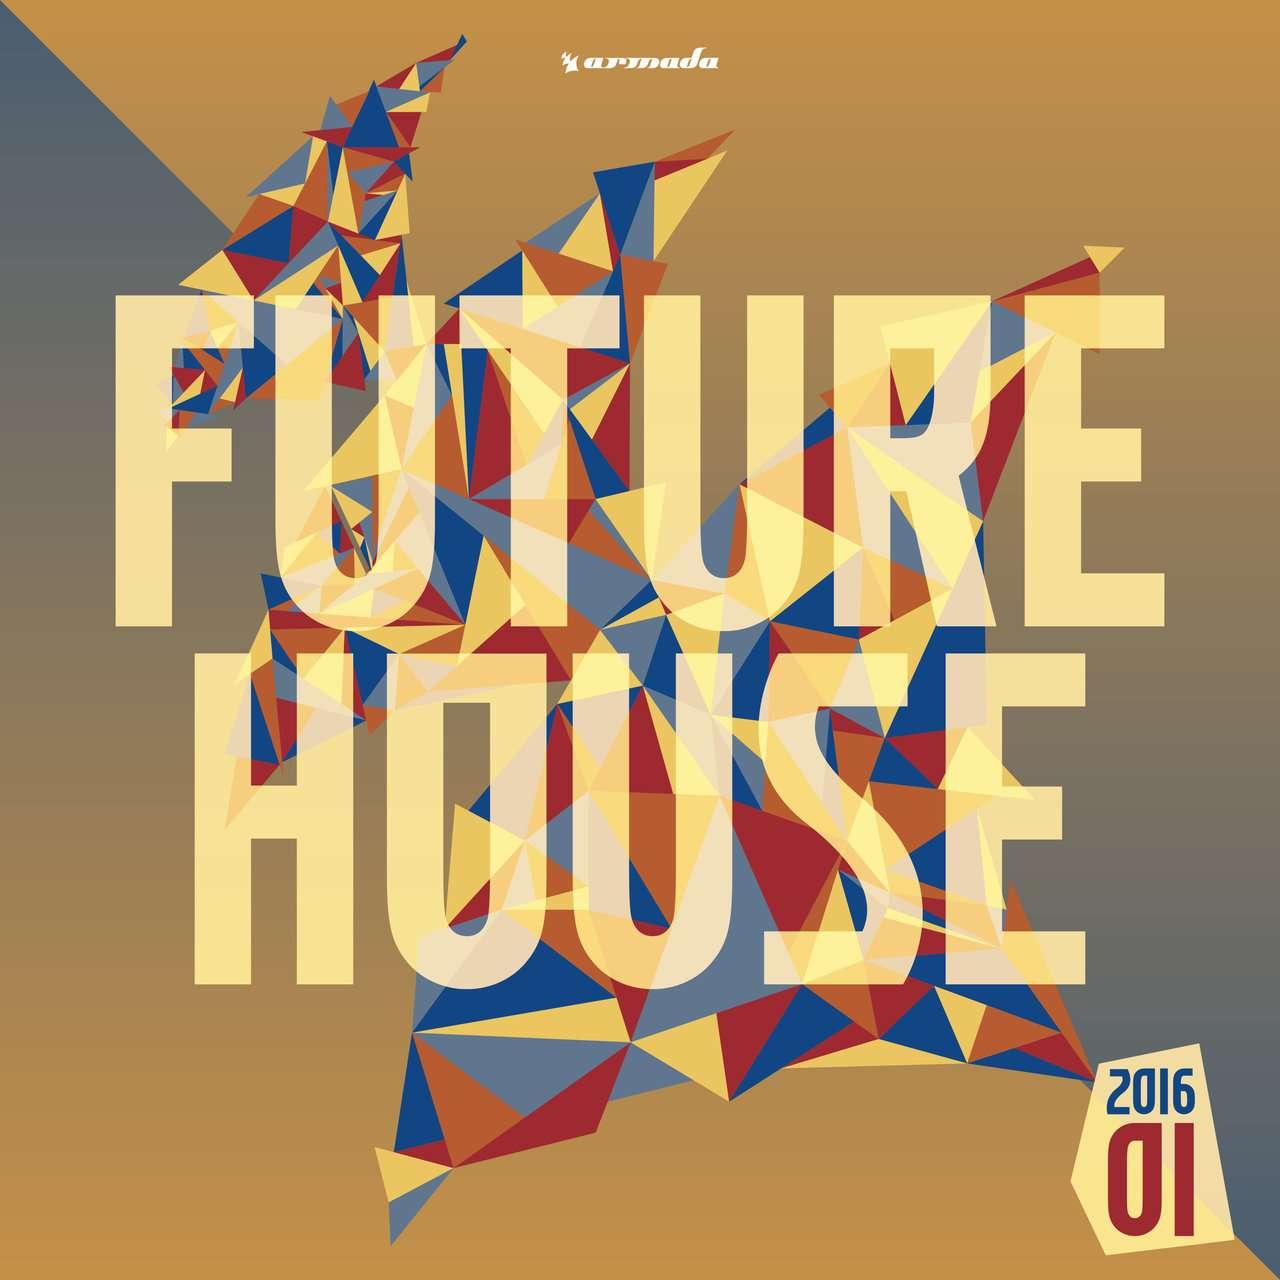 Armada《Future House 2016-01》[CD级无损/44.1kHz/16bit]